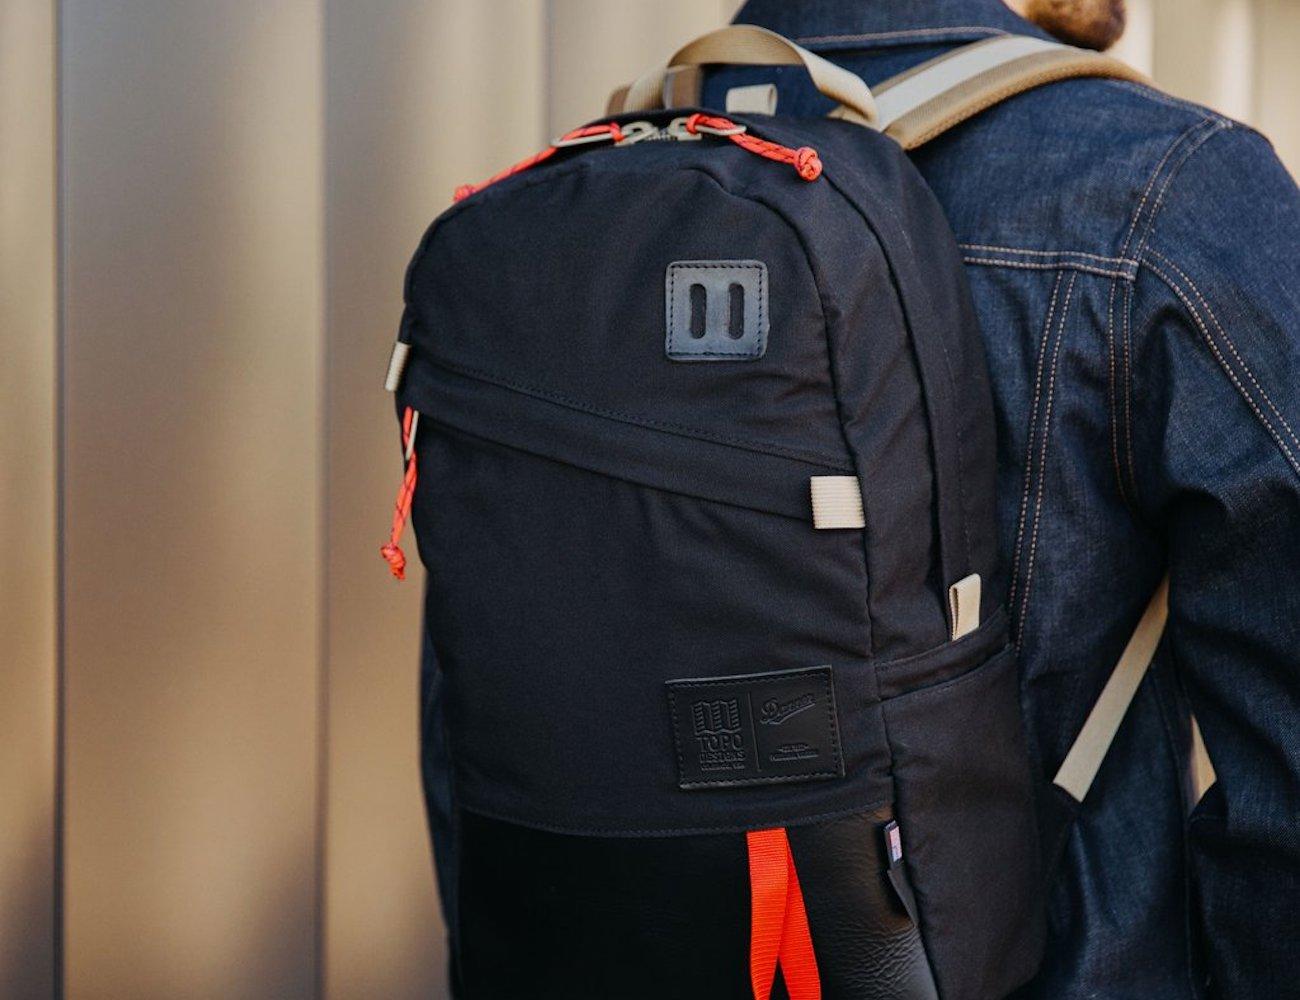 Topo+Designs+Danner+Daypack